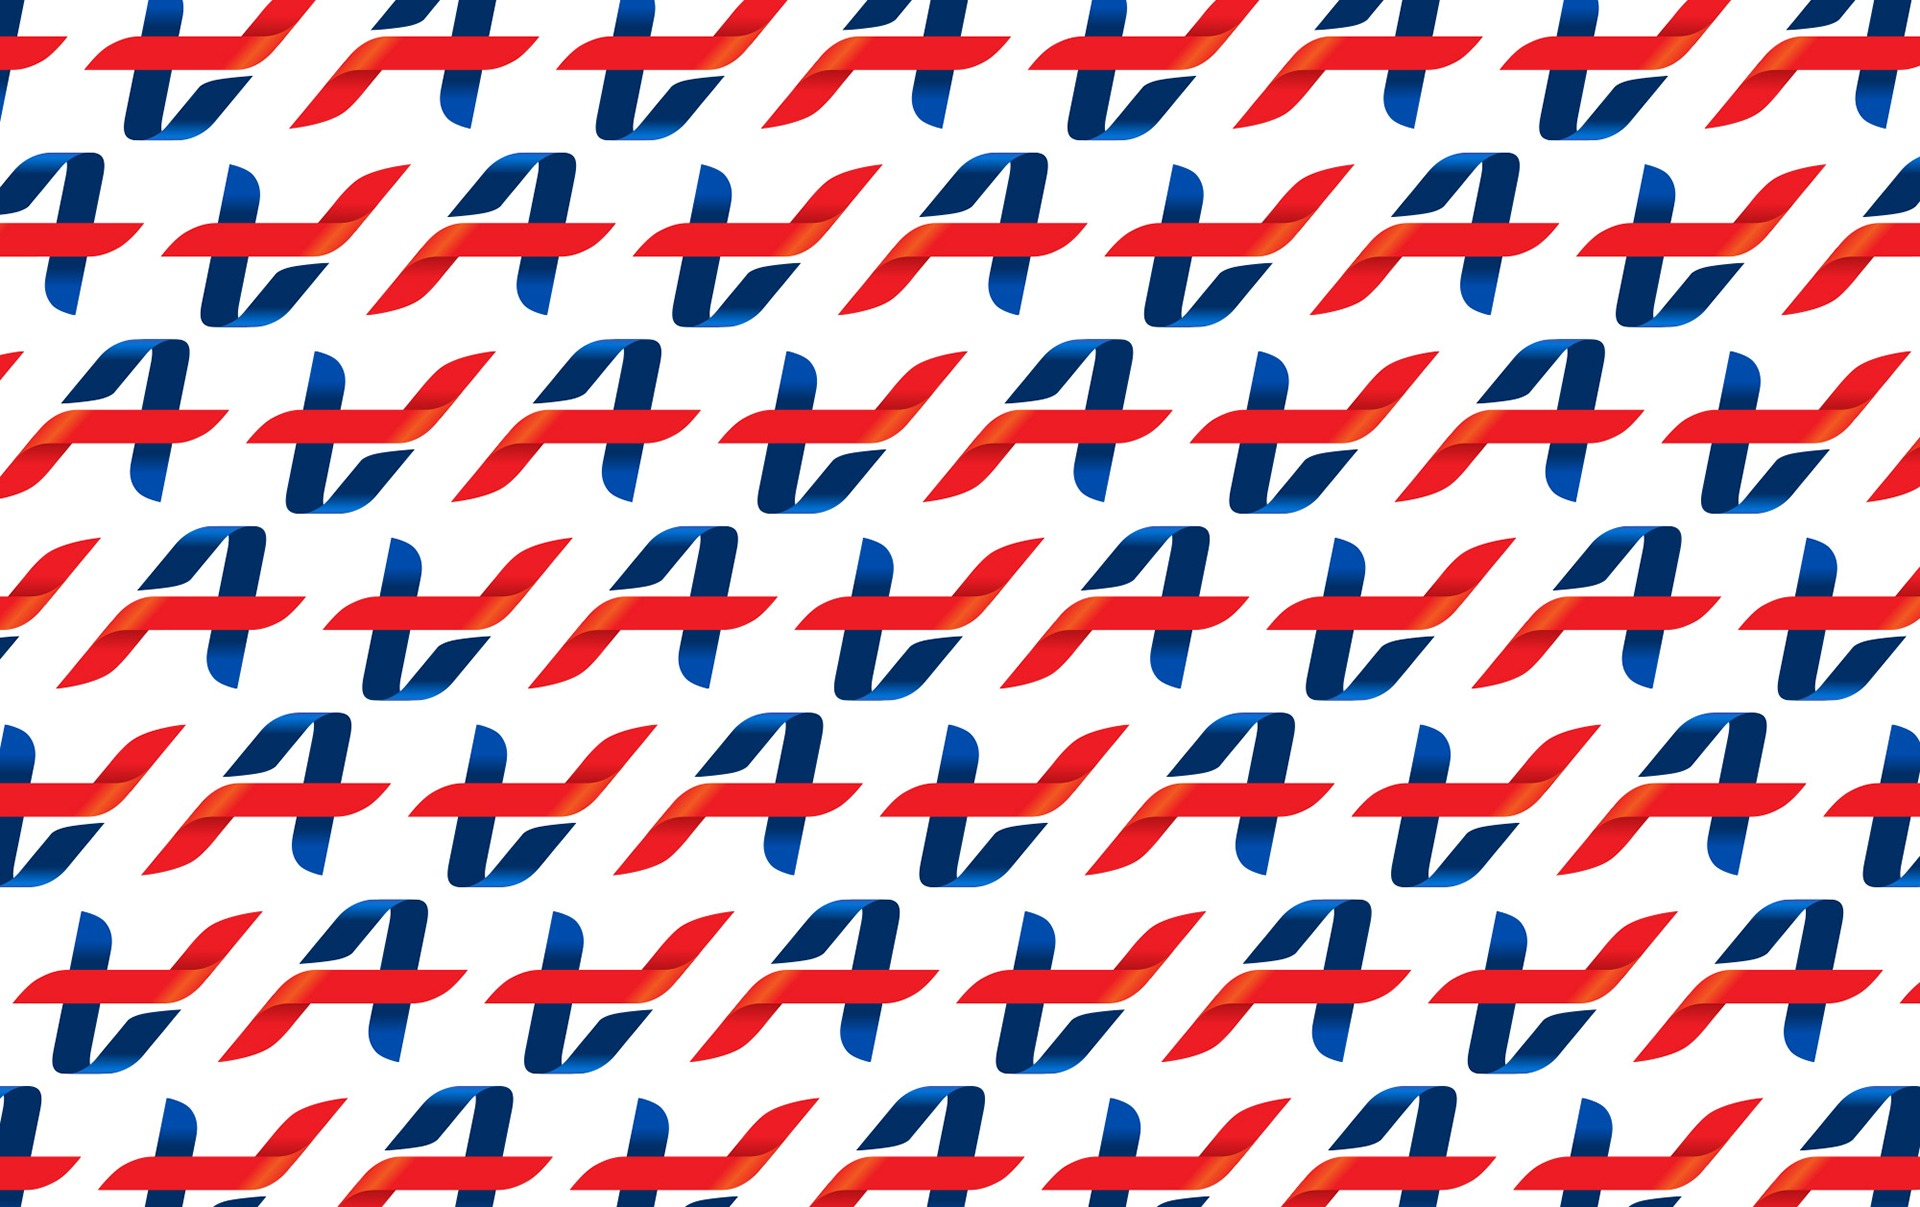 Фирменный паттерн авиакомпании,, re-branding, ребрендинг авиакомпании, Asgard Branding, логотип Аэрофлот, Aeroflot, Asgard Branding